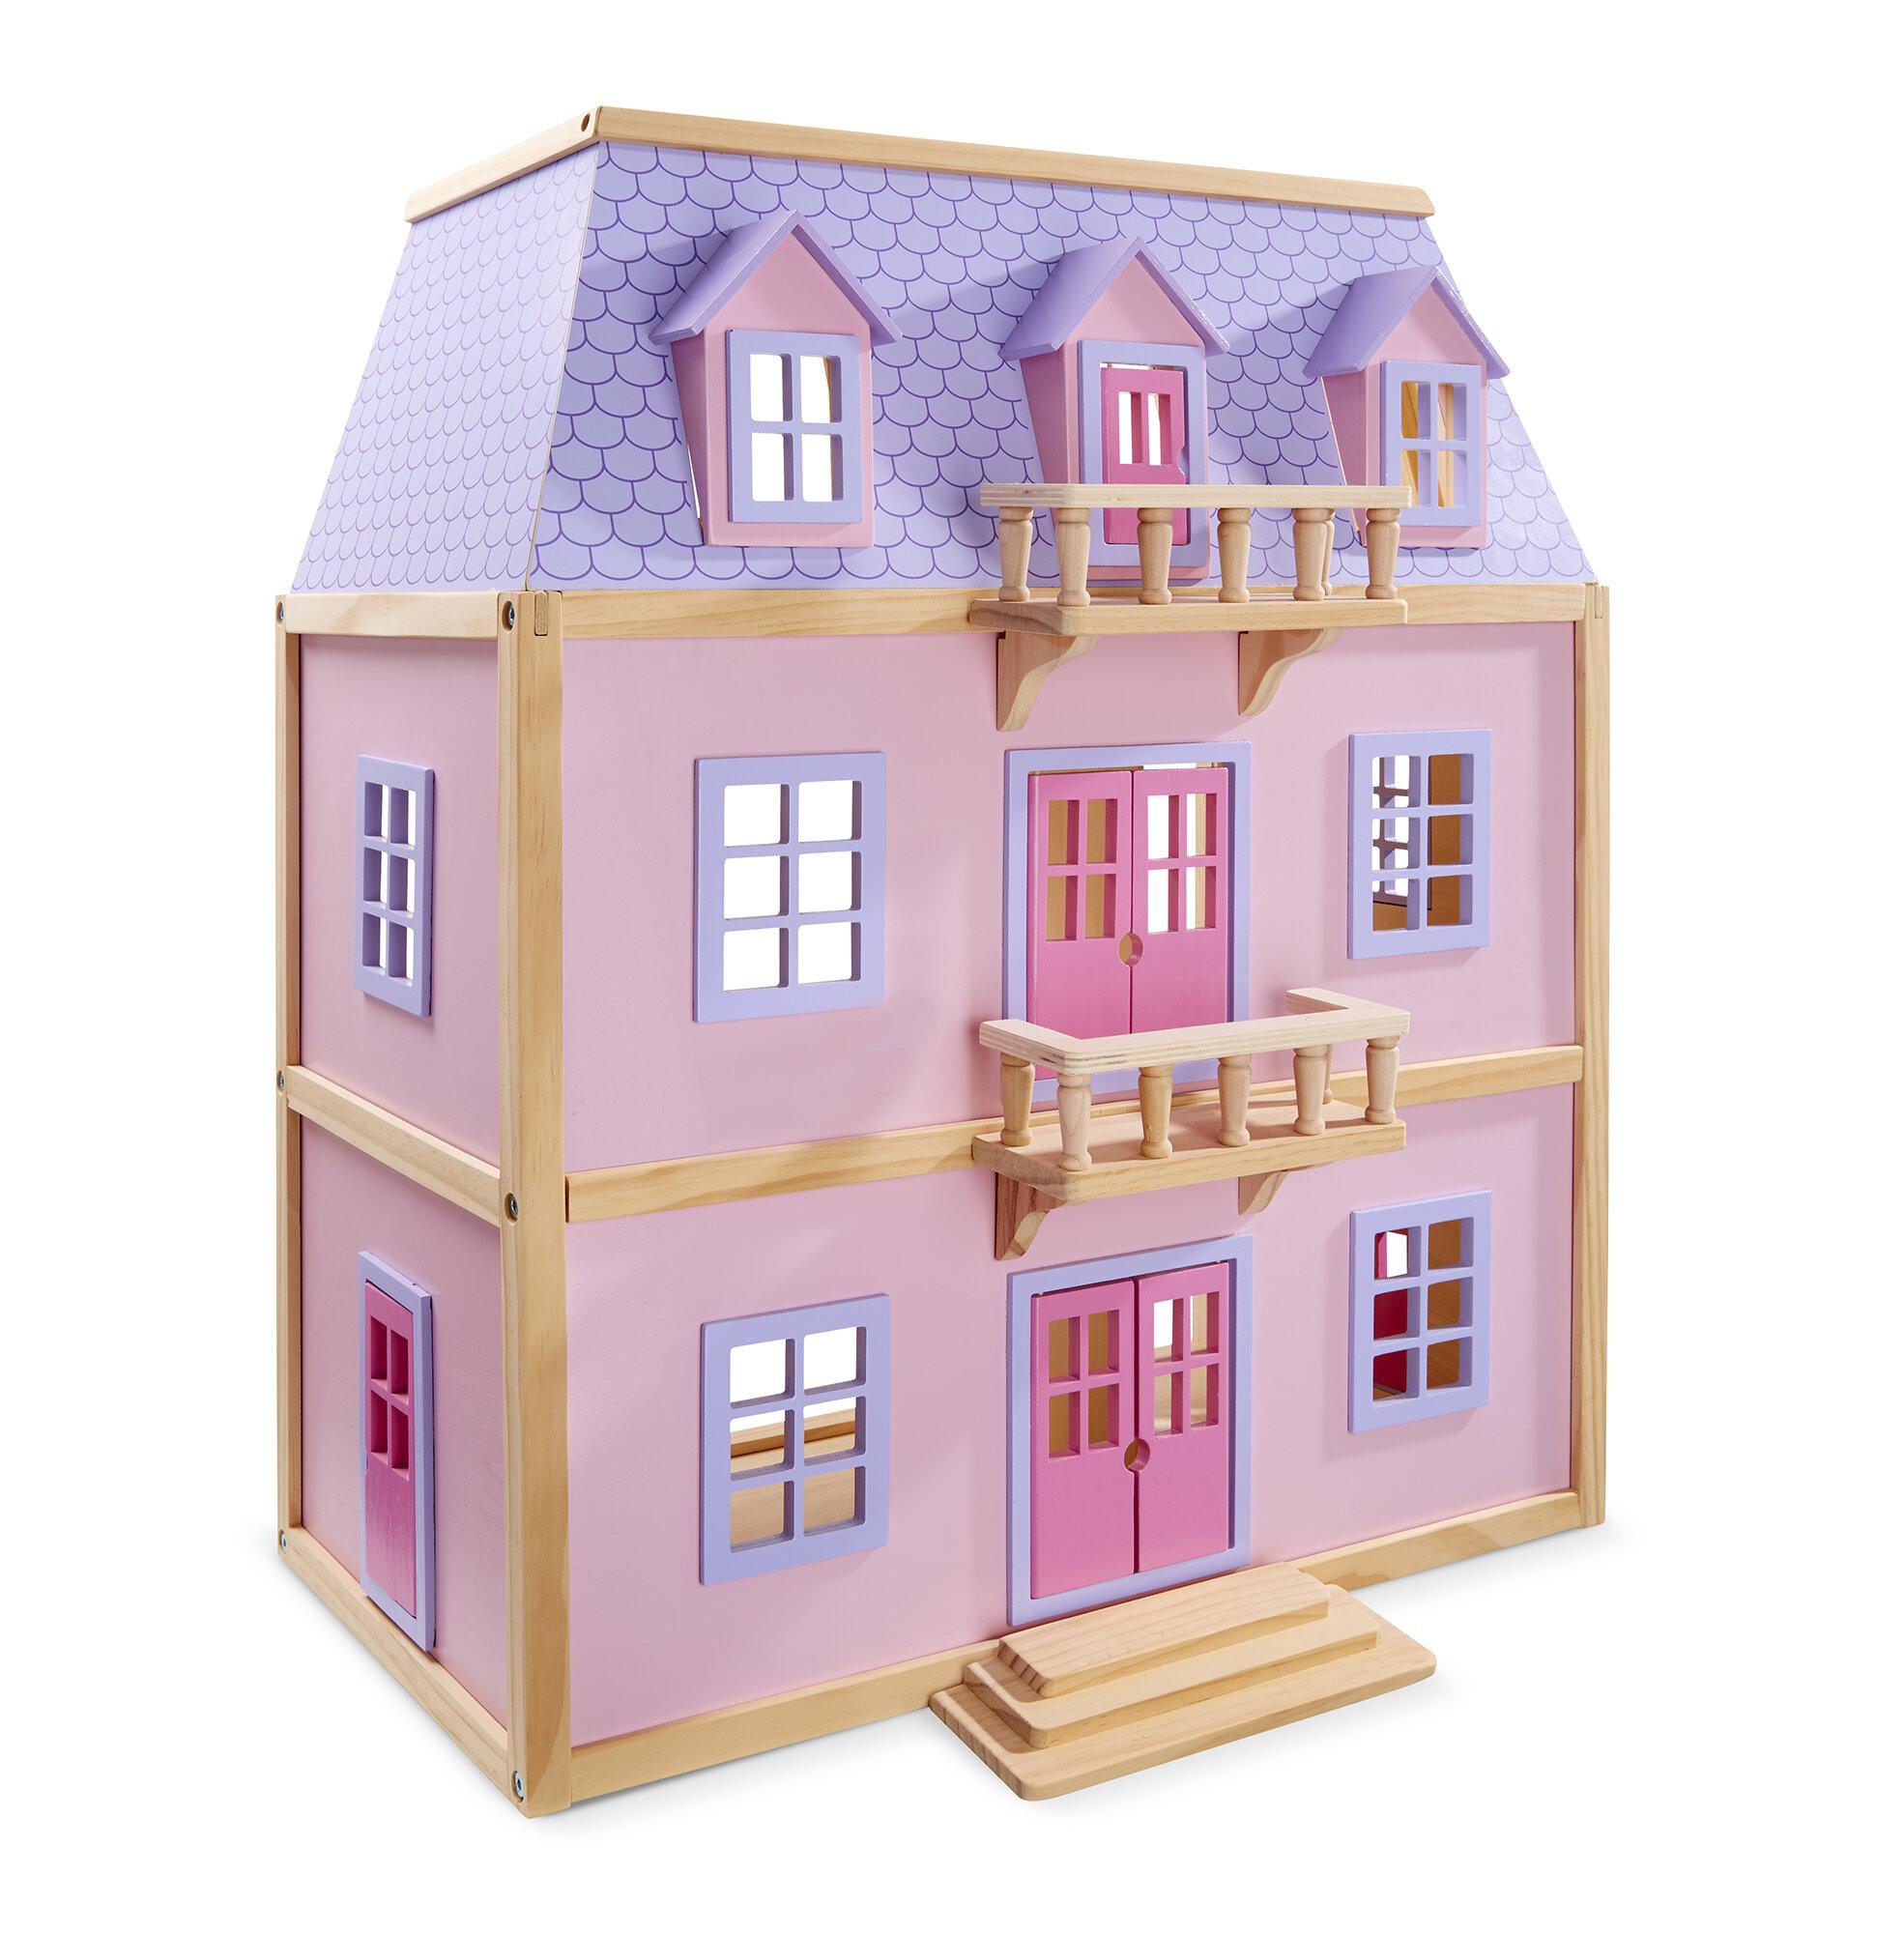 Melissa & Doug Wood Furnished Mansion & Reviews | Wayfair